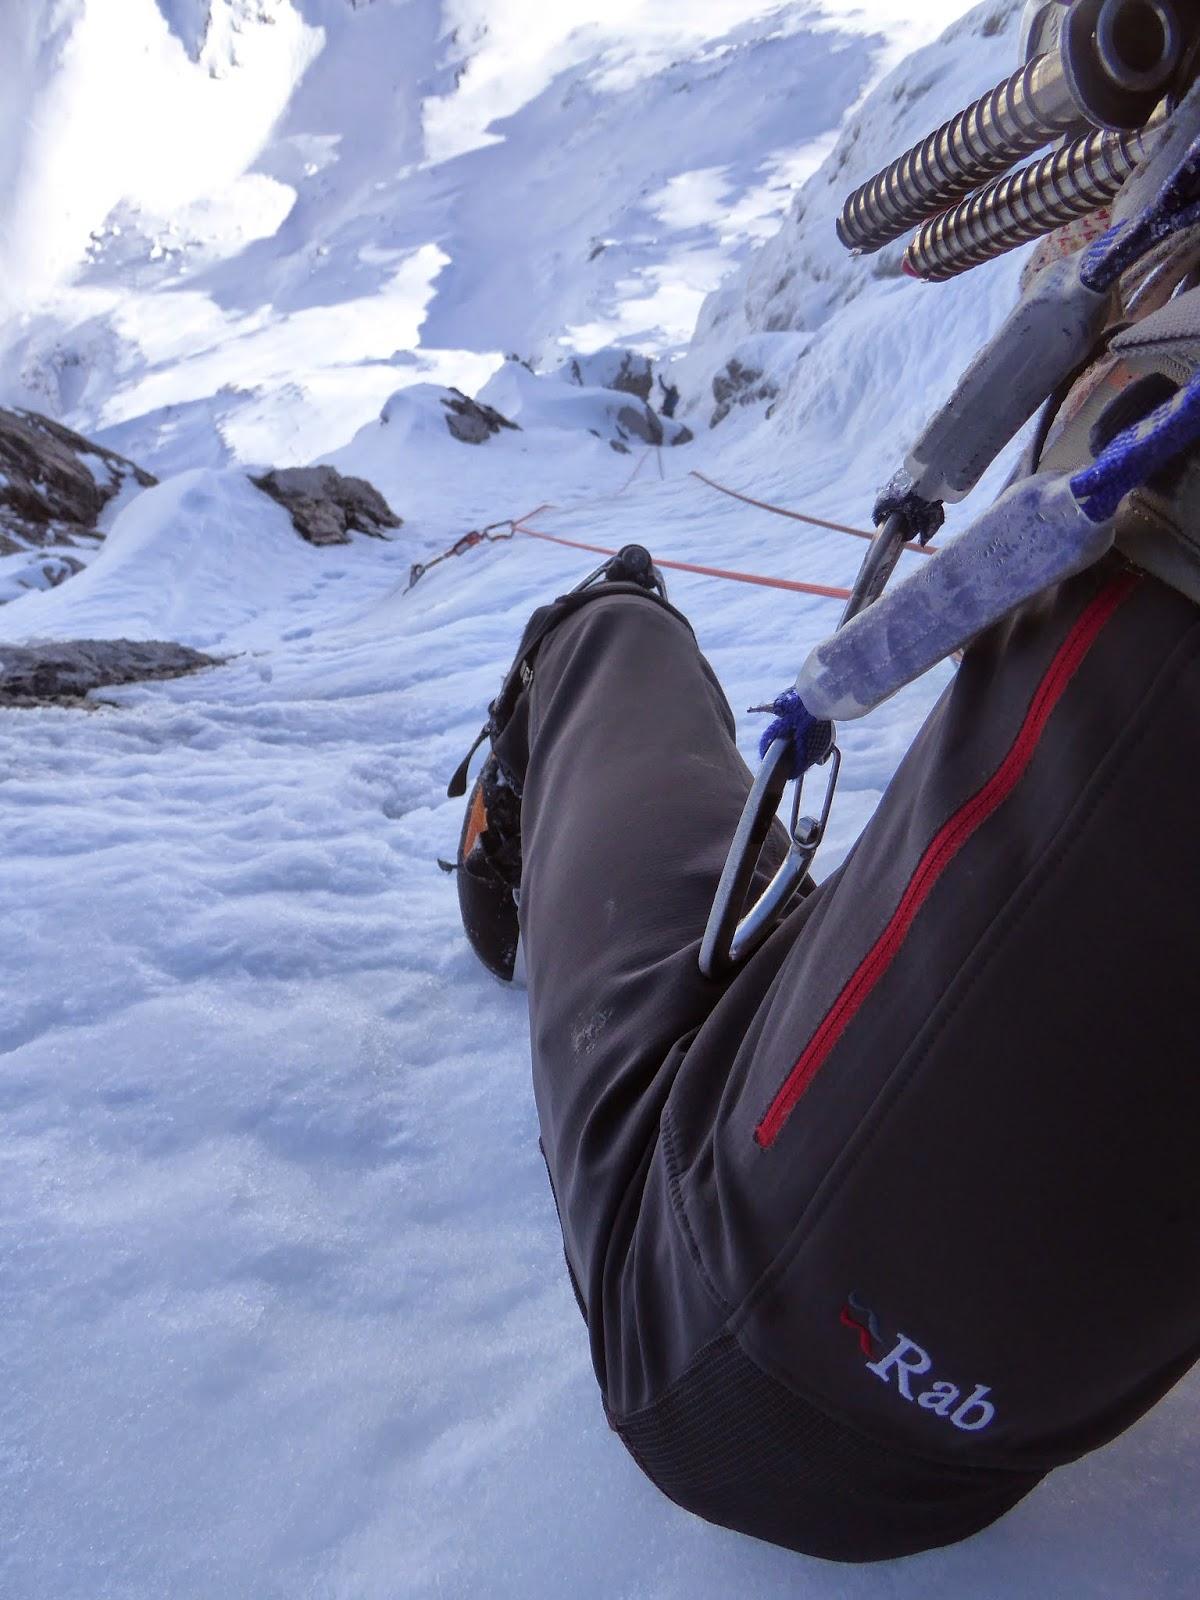 Guia de alta montaña Fernando Calvo . escaladas invernales en los picos de europa